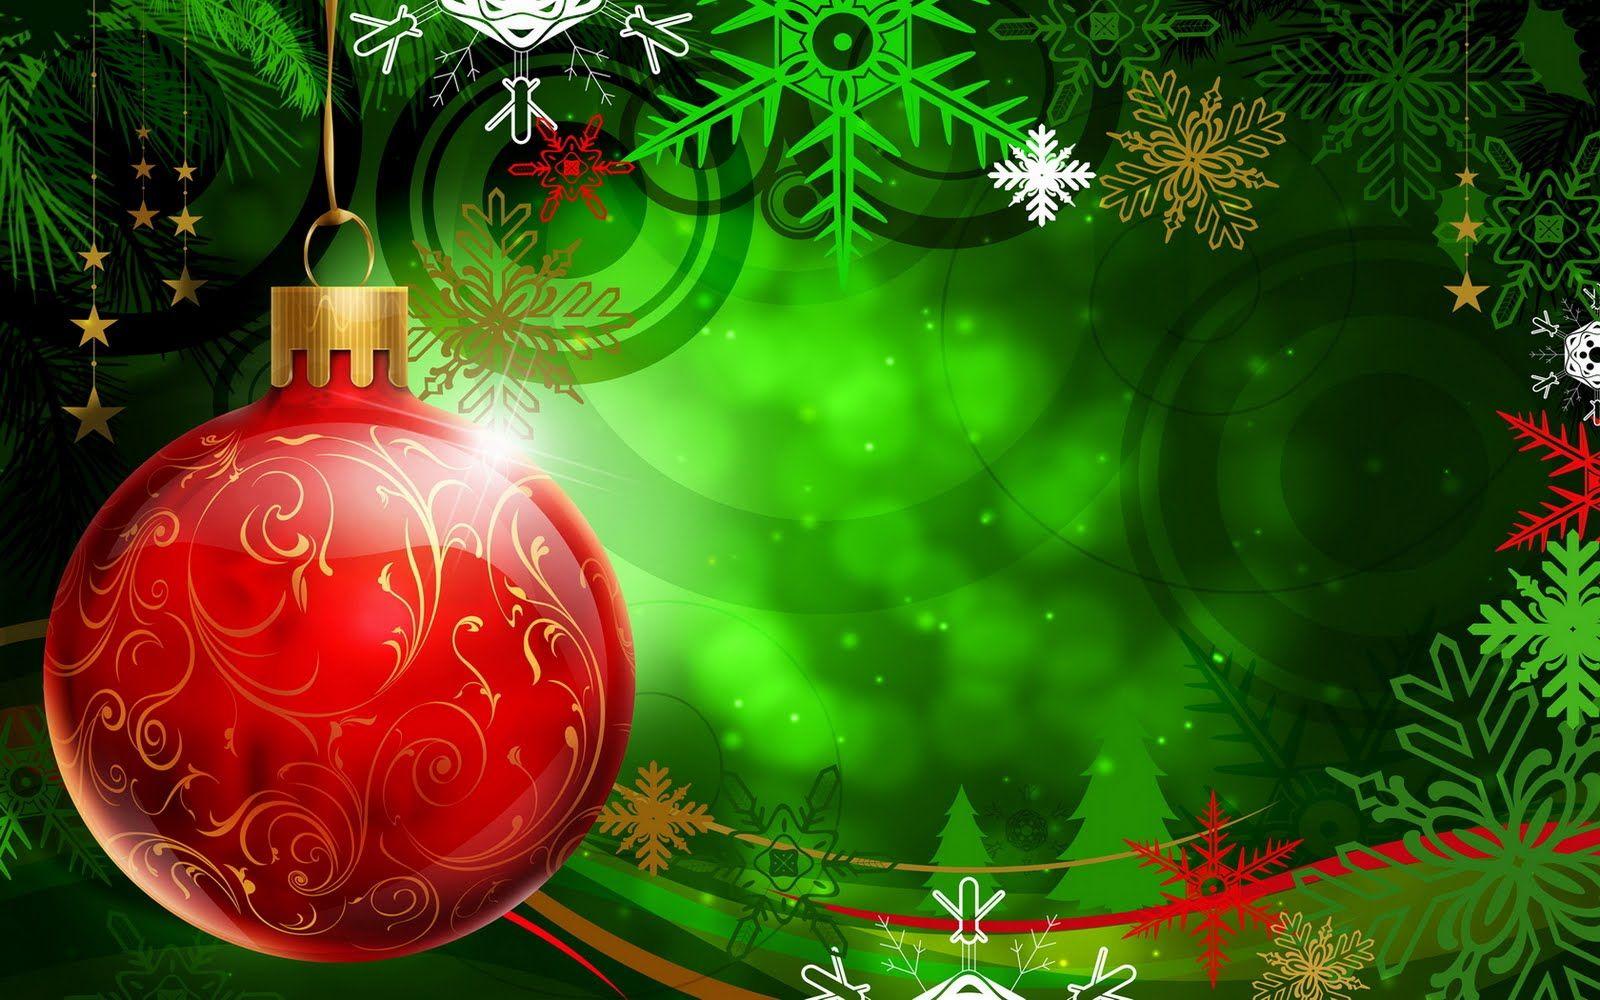 Free Animated Christmas Screensavers Free Screen Savers Free Download Free Wa Colorful Christmas Decorations Merry Christmas Wallpaper Christmas Wallpaper Hd